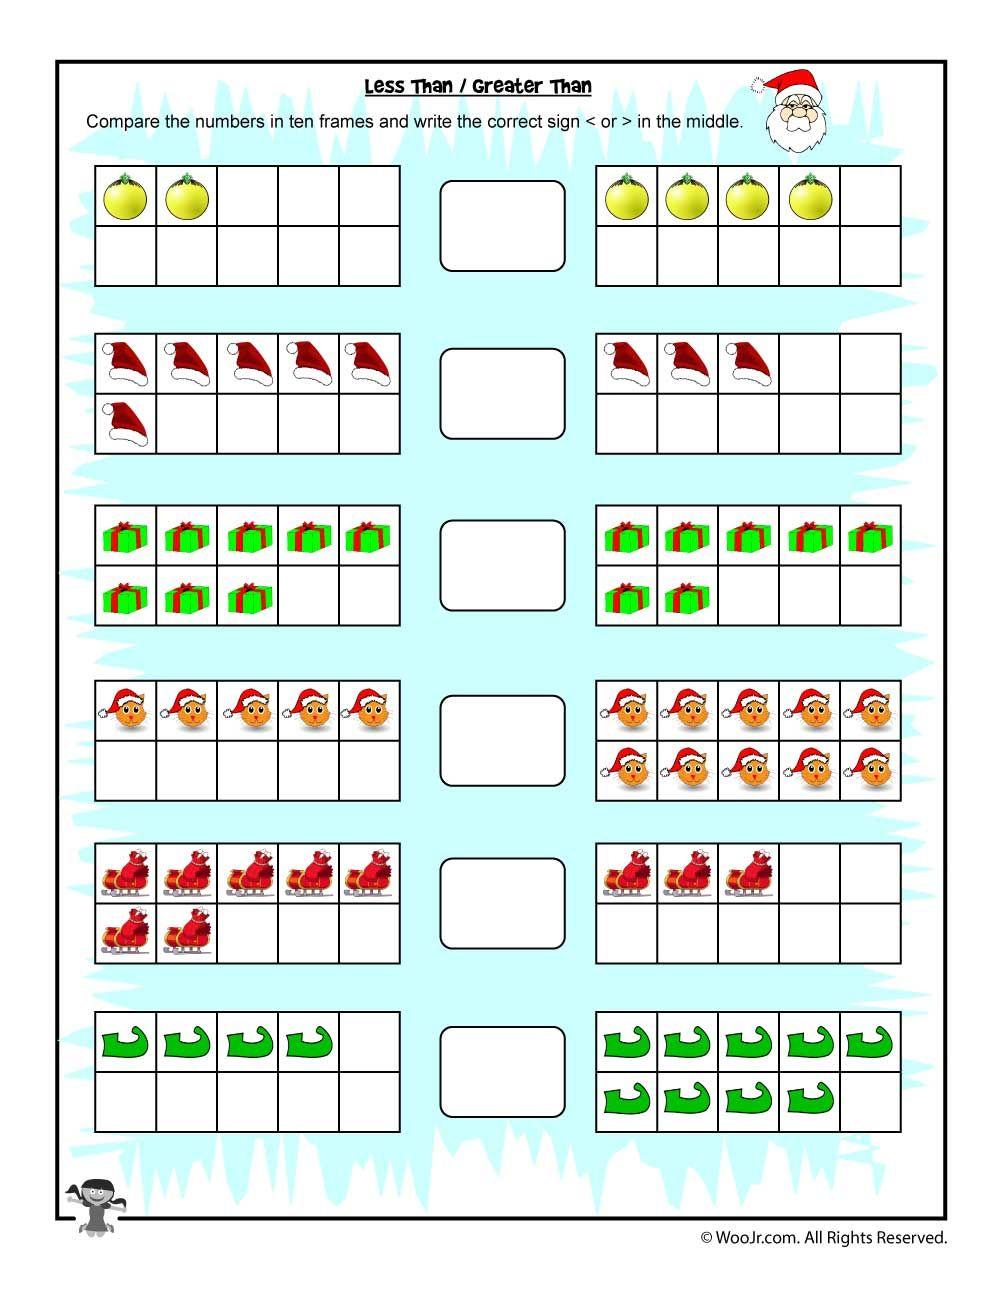 Worksheets Greater Than Less Than Worksheets easy counting greater thanless than worksheet 1st grade math worksheet